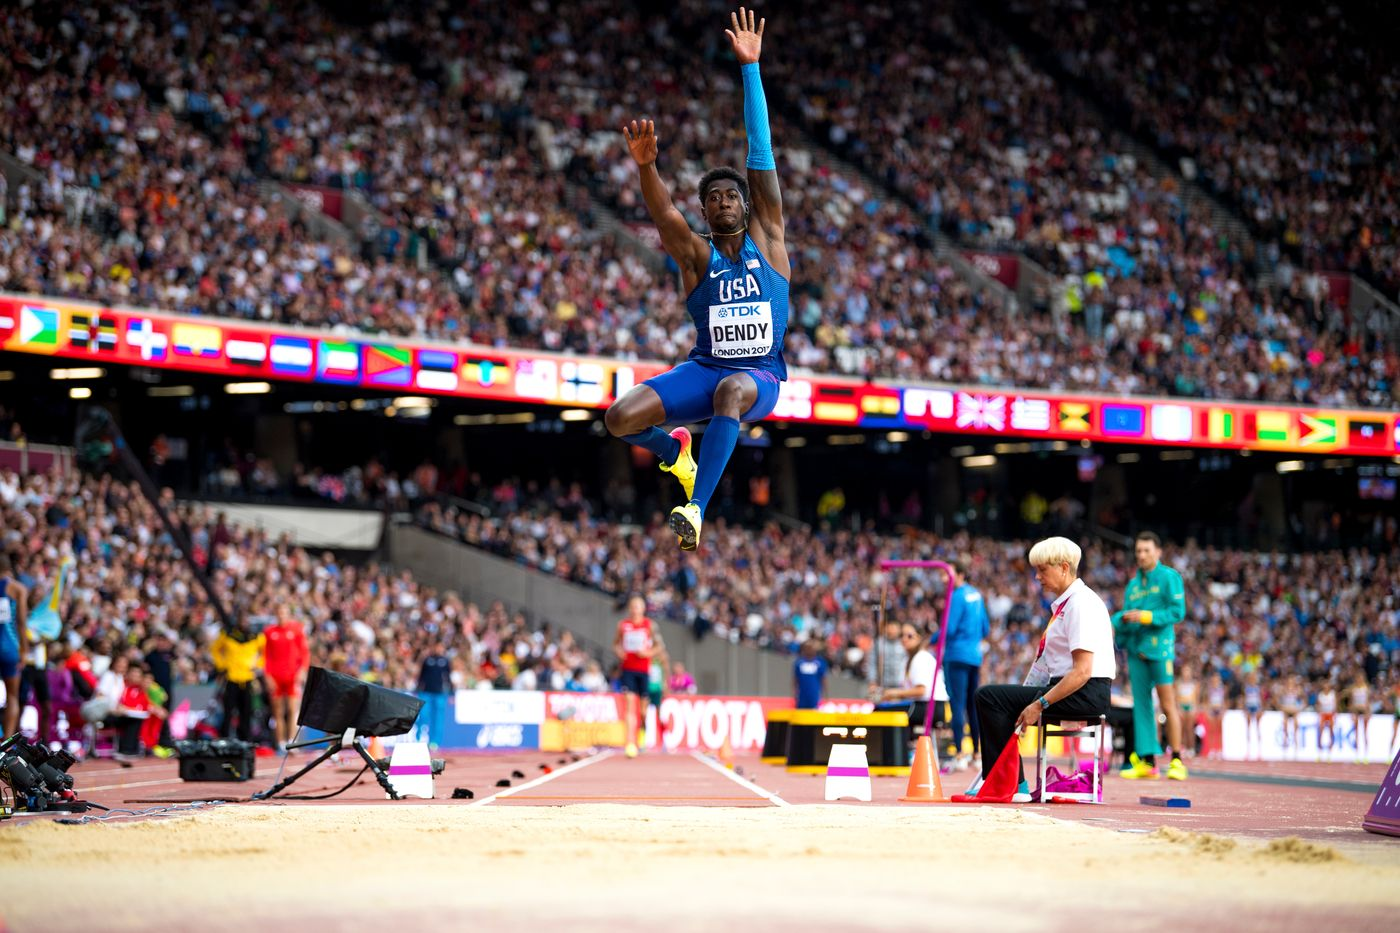 2017 IAAF WC London day 1 dendy jump jeff cohen photo  3293.jpg